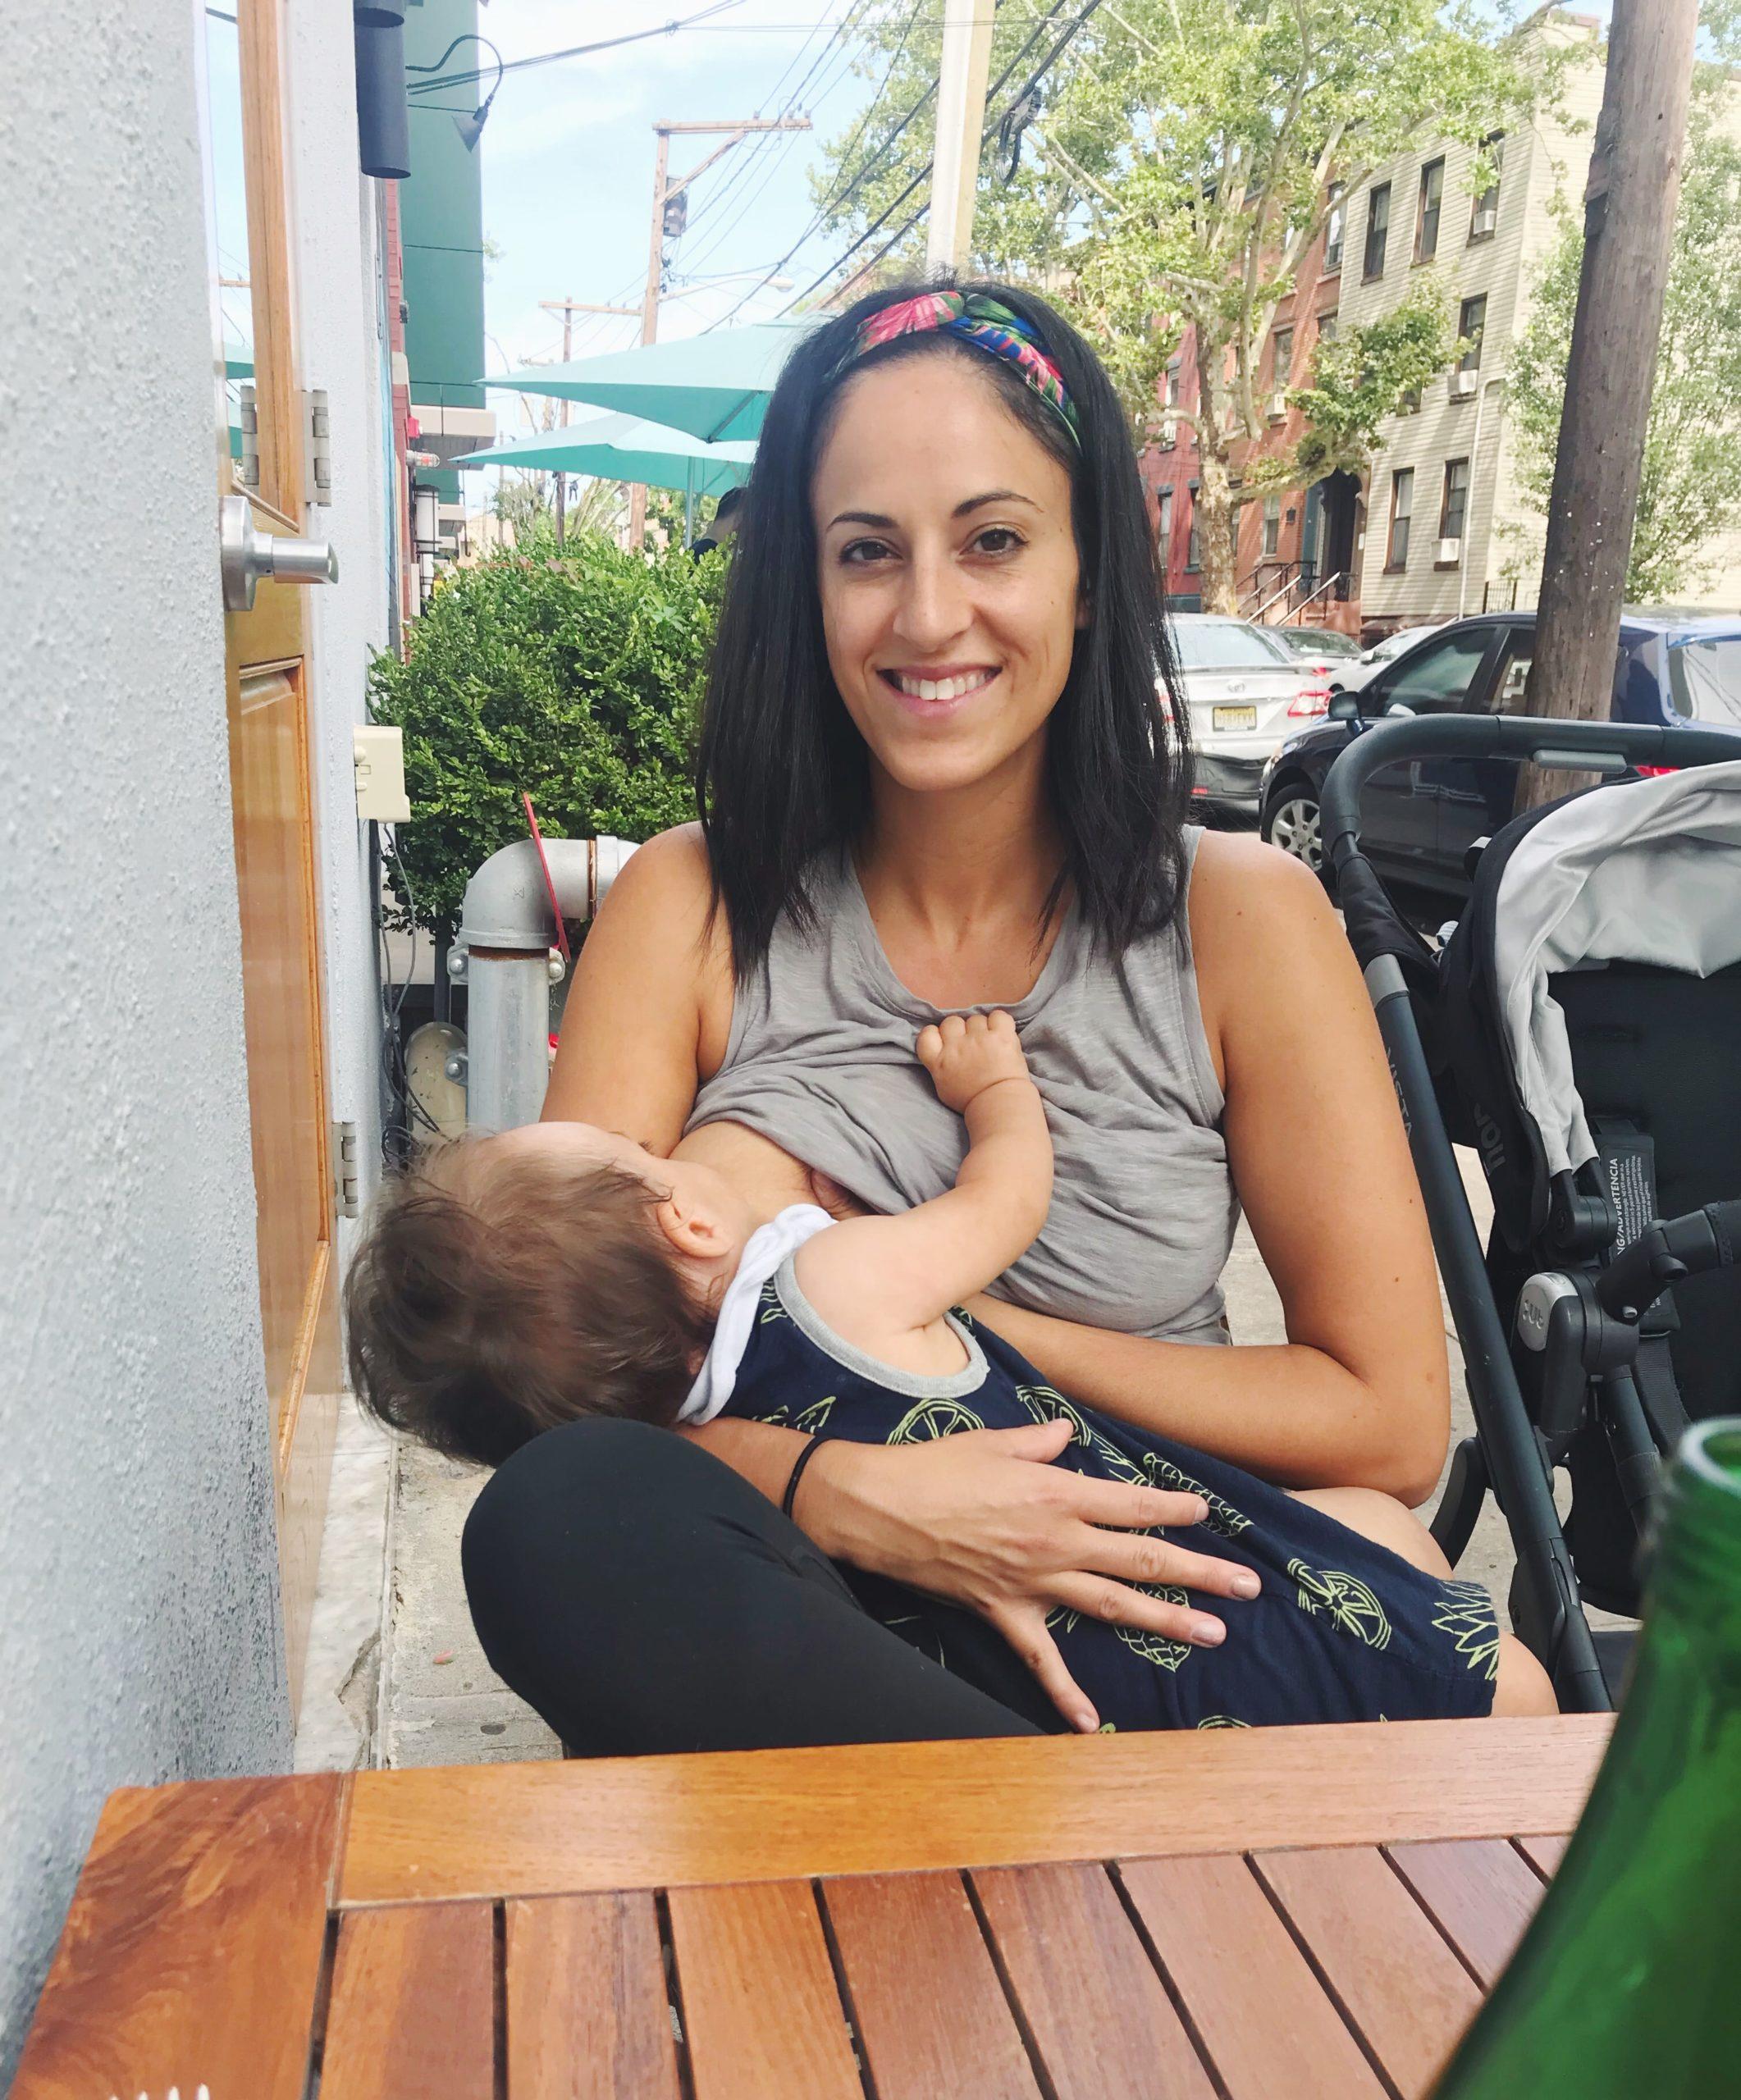 breastfeeding update: approaching one year of nursing